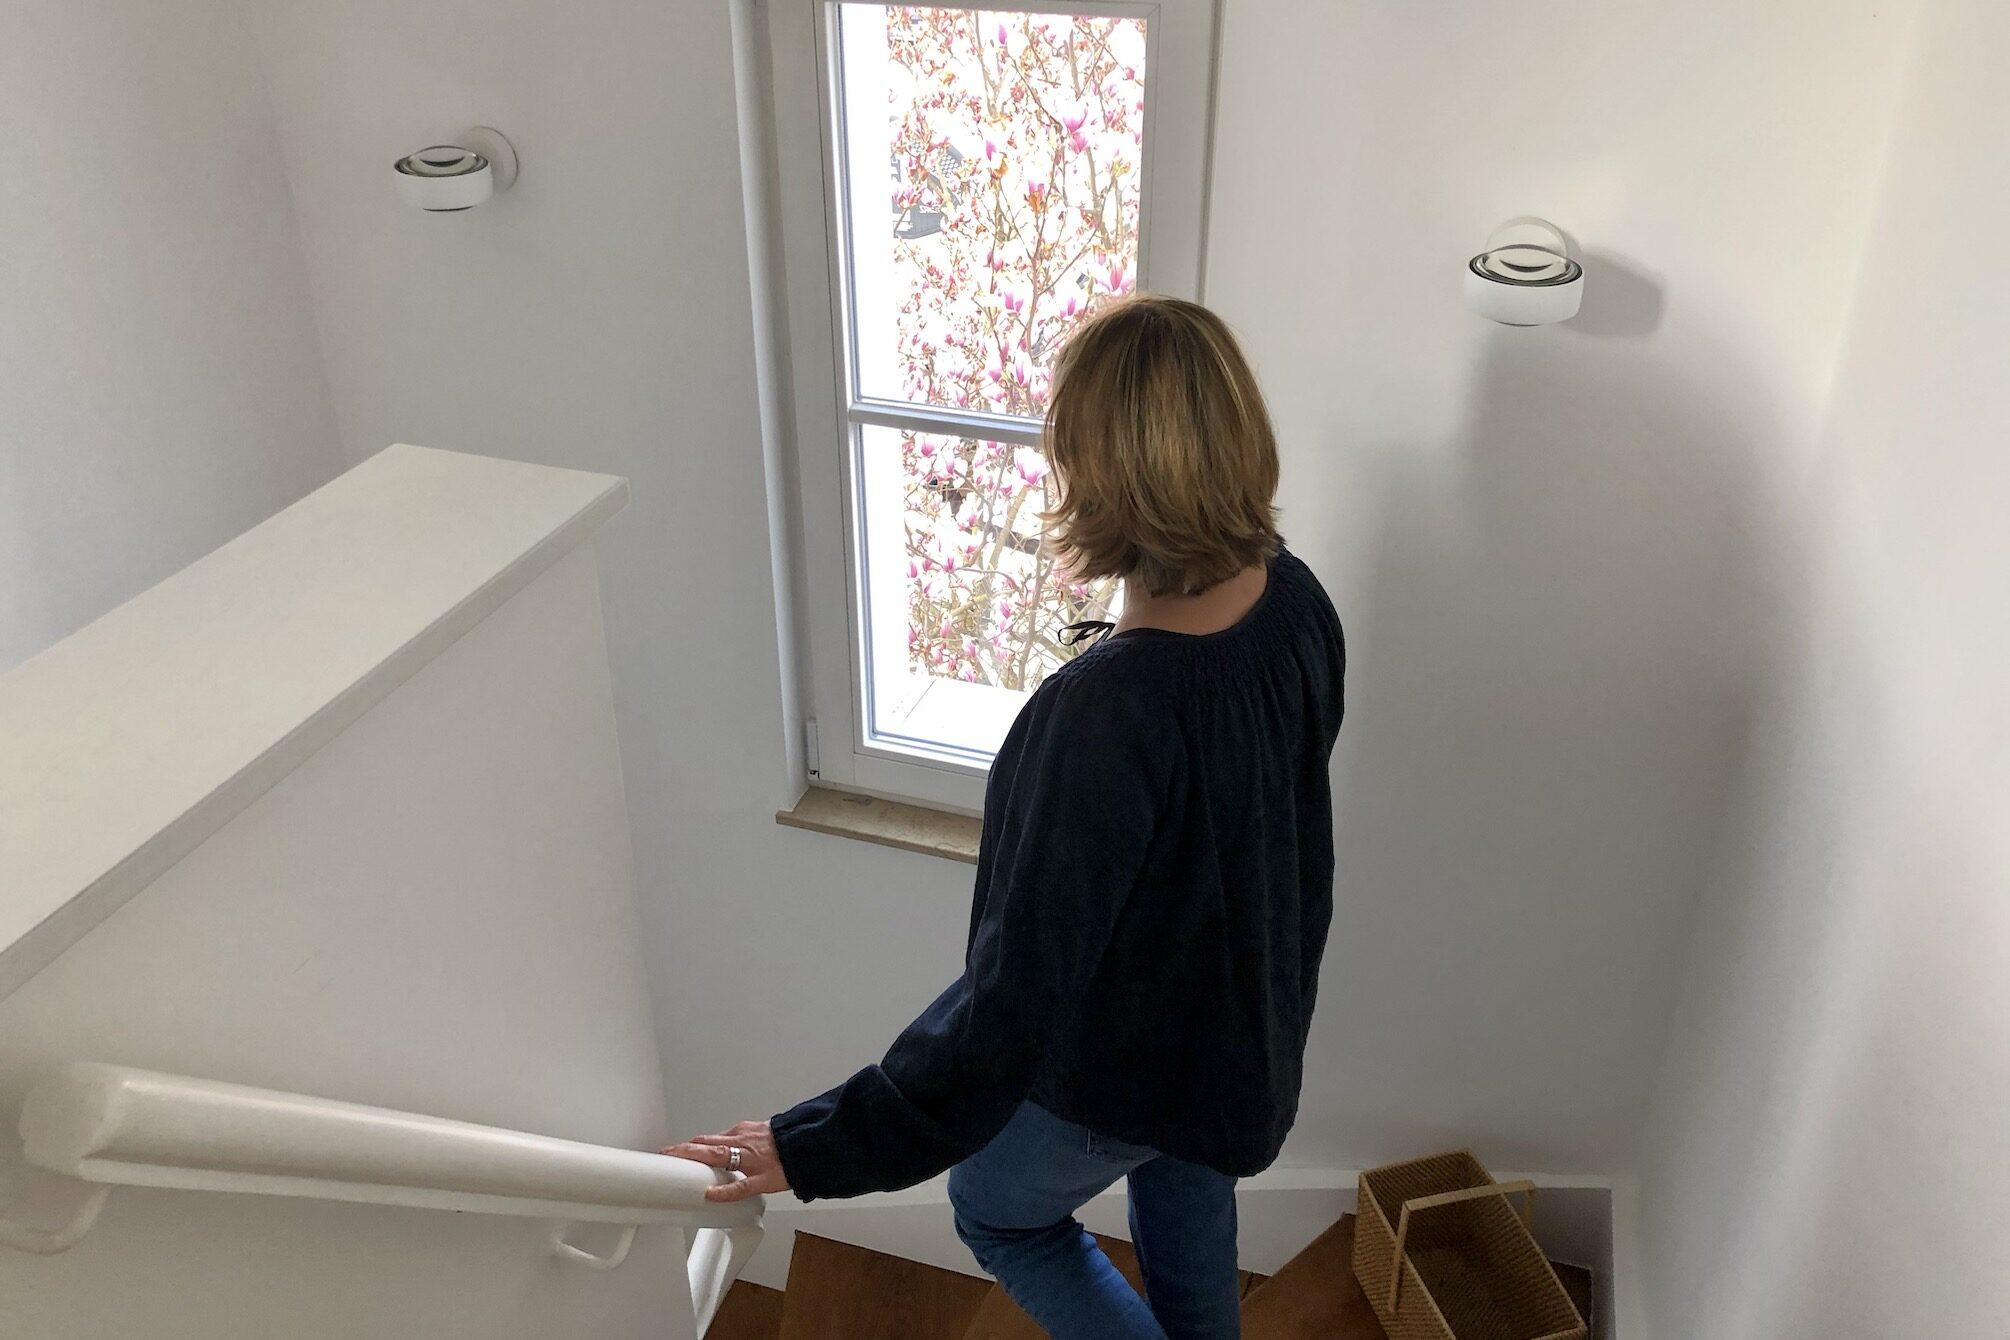 Mama allein zu Haus - www.expatmamas.de/blog/ #expatmamas #imauslandzuhause #beziehung